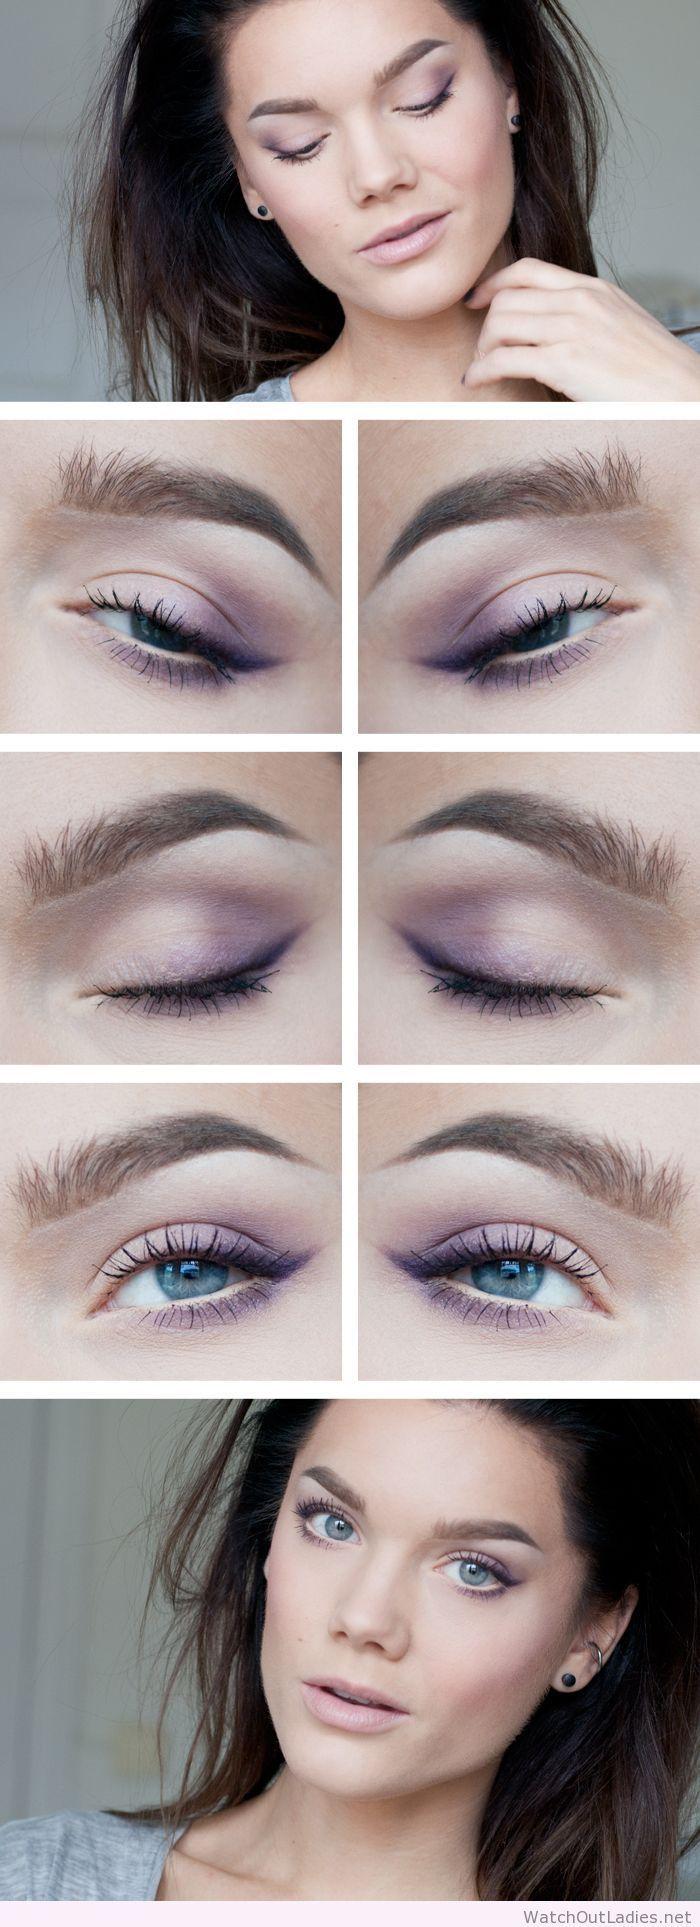 Linda Hallberg simple purple eye makeup